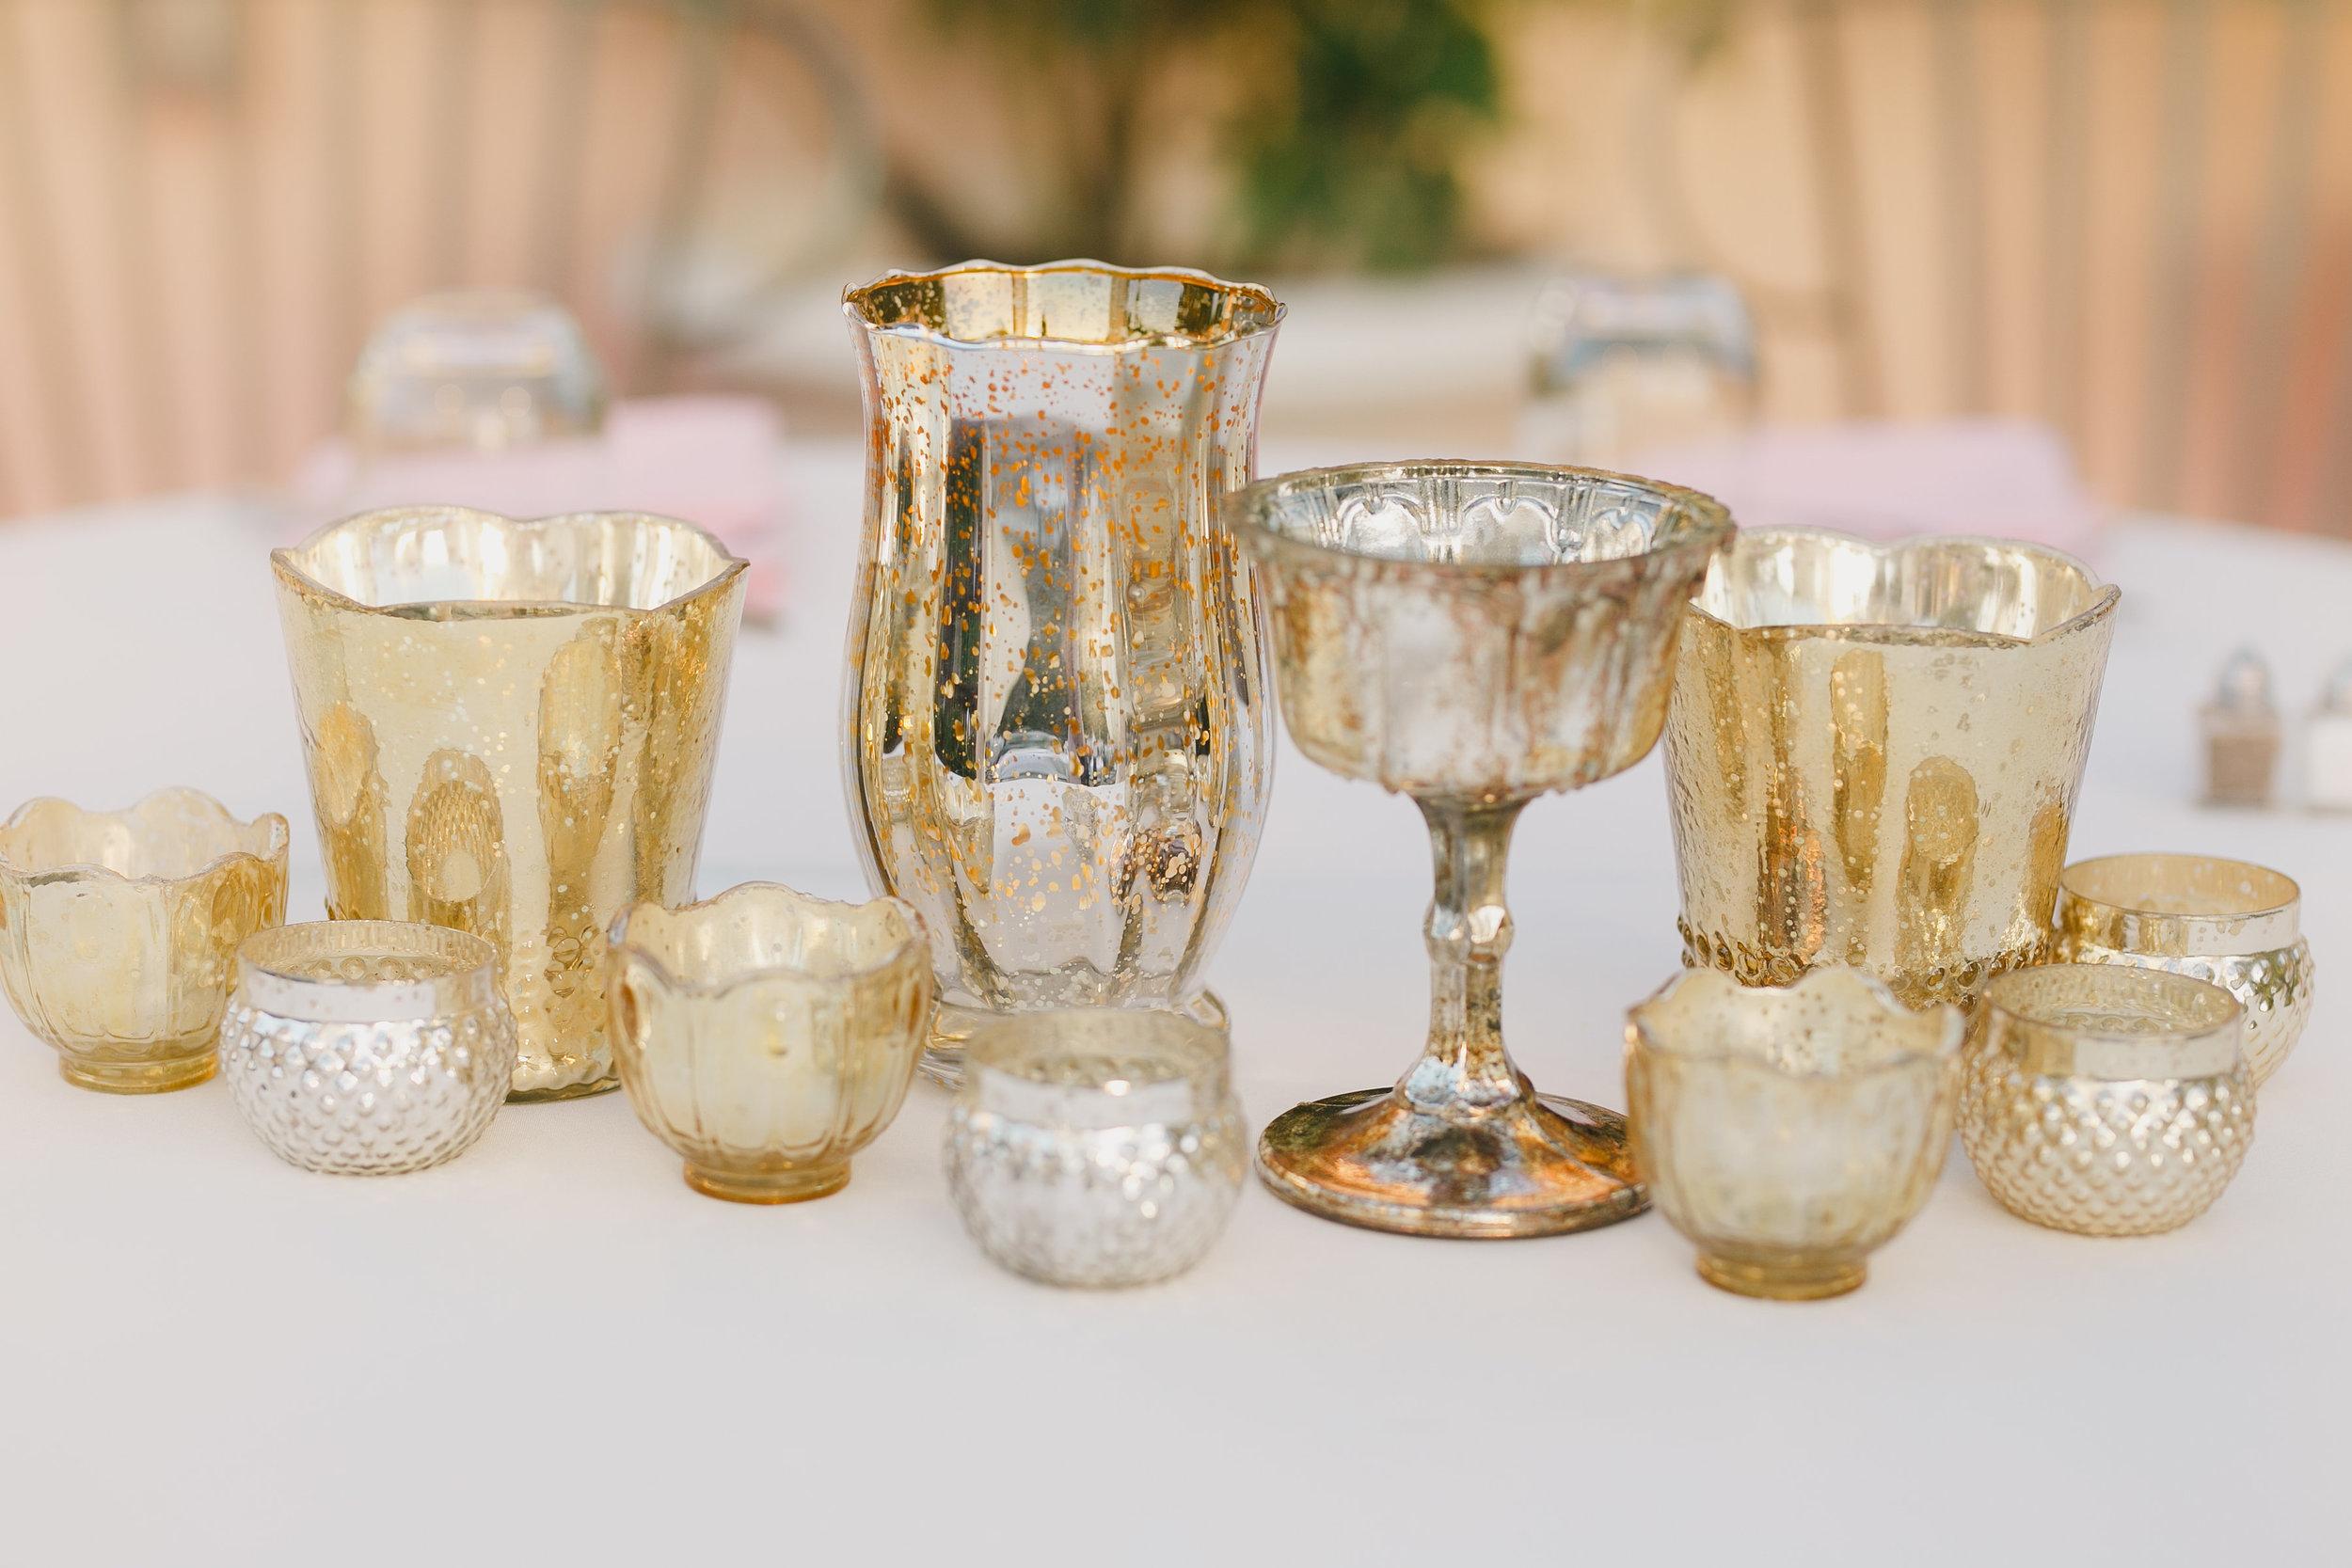 www.santabarbarawedding.com | Kristen Booth Photography | Rincon Beach Club | Reception Details | Candles